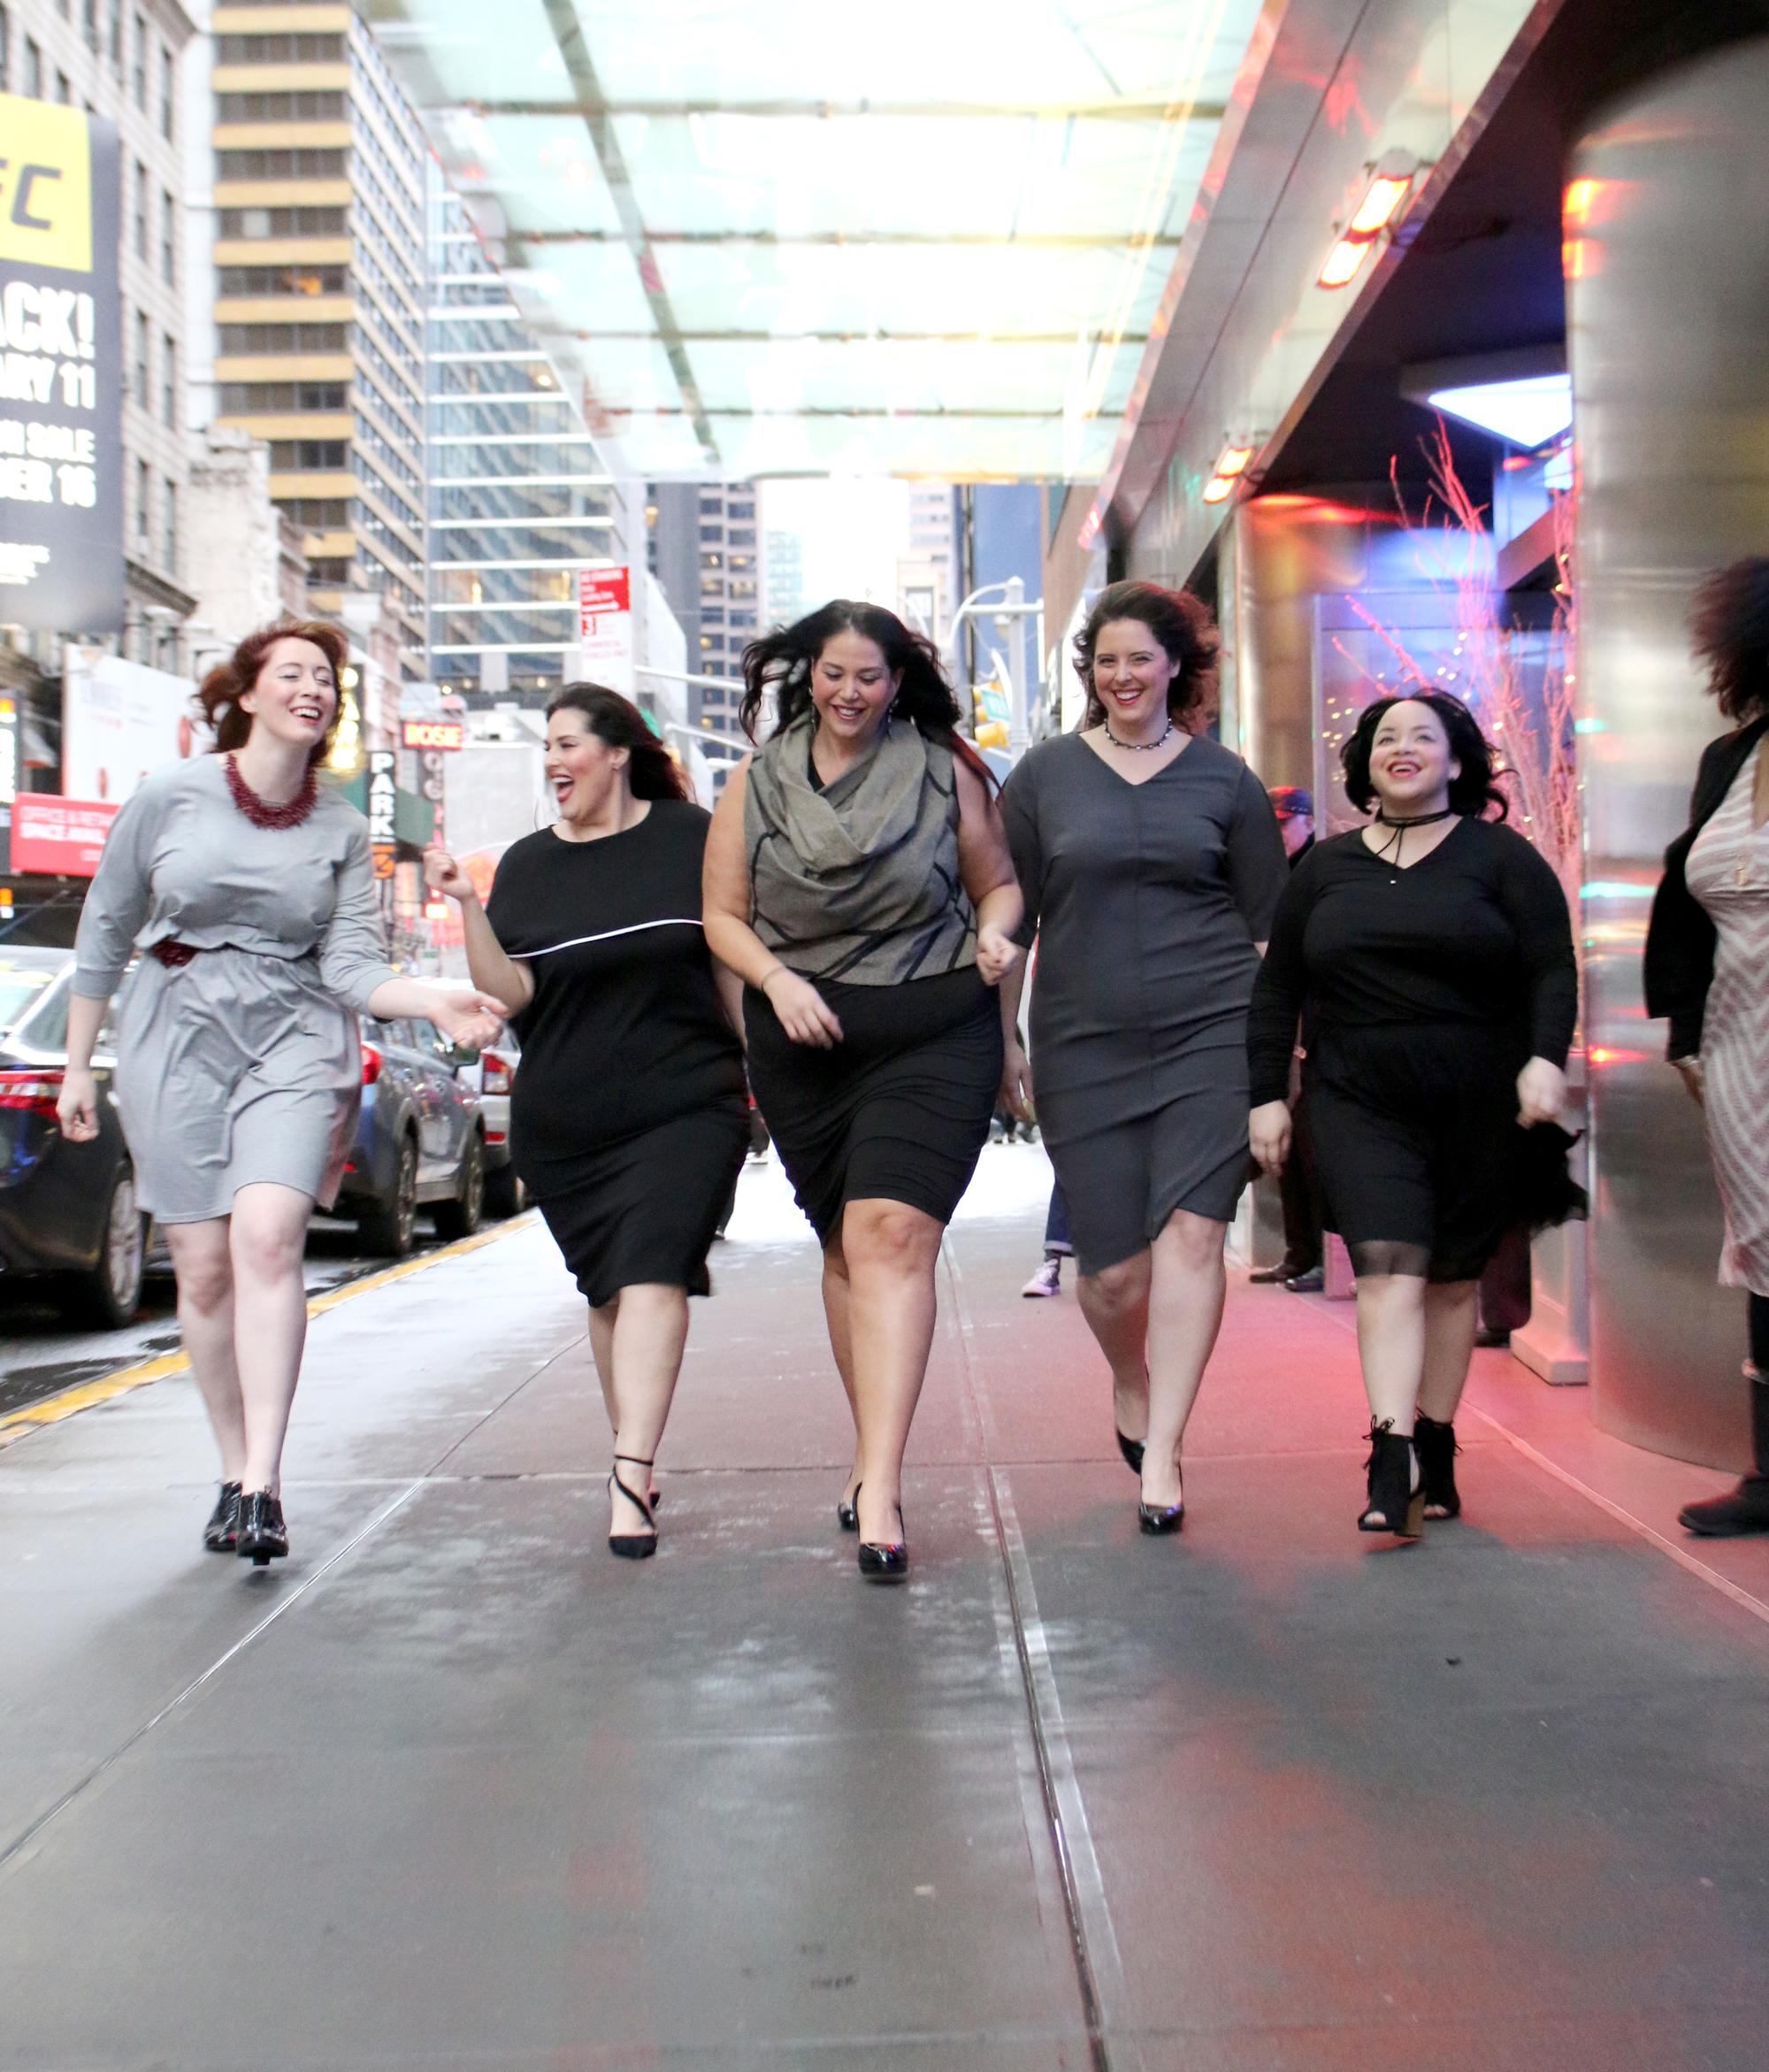 Models (left to right):   Megan Pustaver, Rebecca Ballister, Michelle Tesman, Sarah Whitney, Pressila Stewart Photo:Nancy Anteby